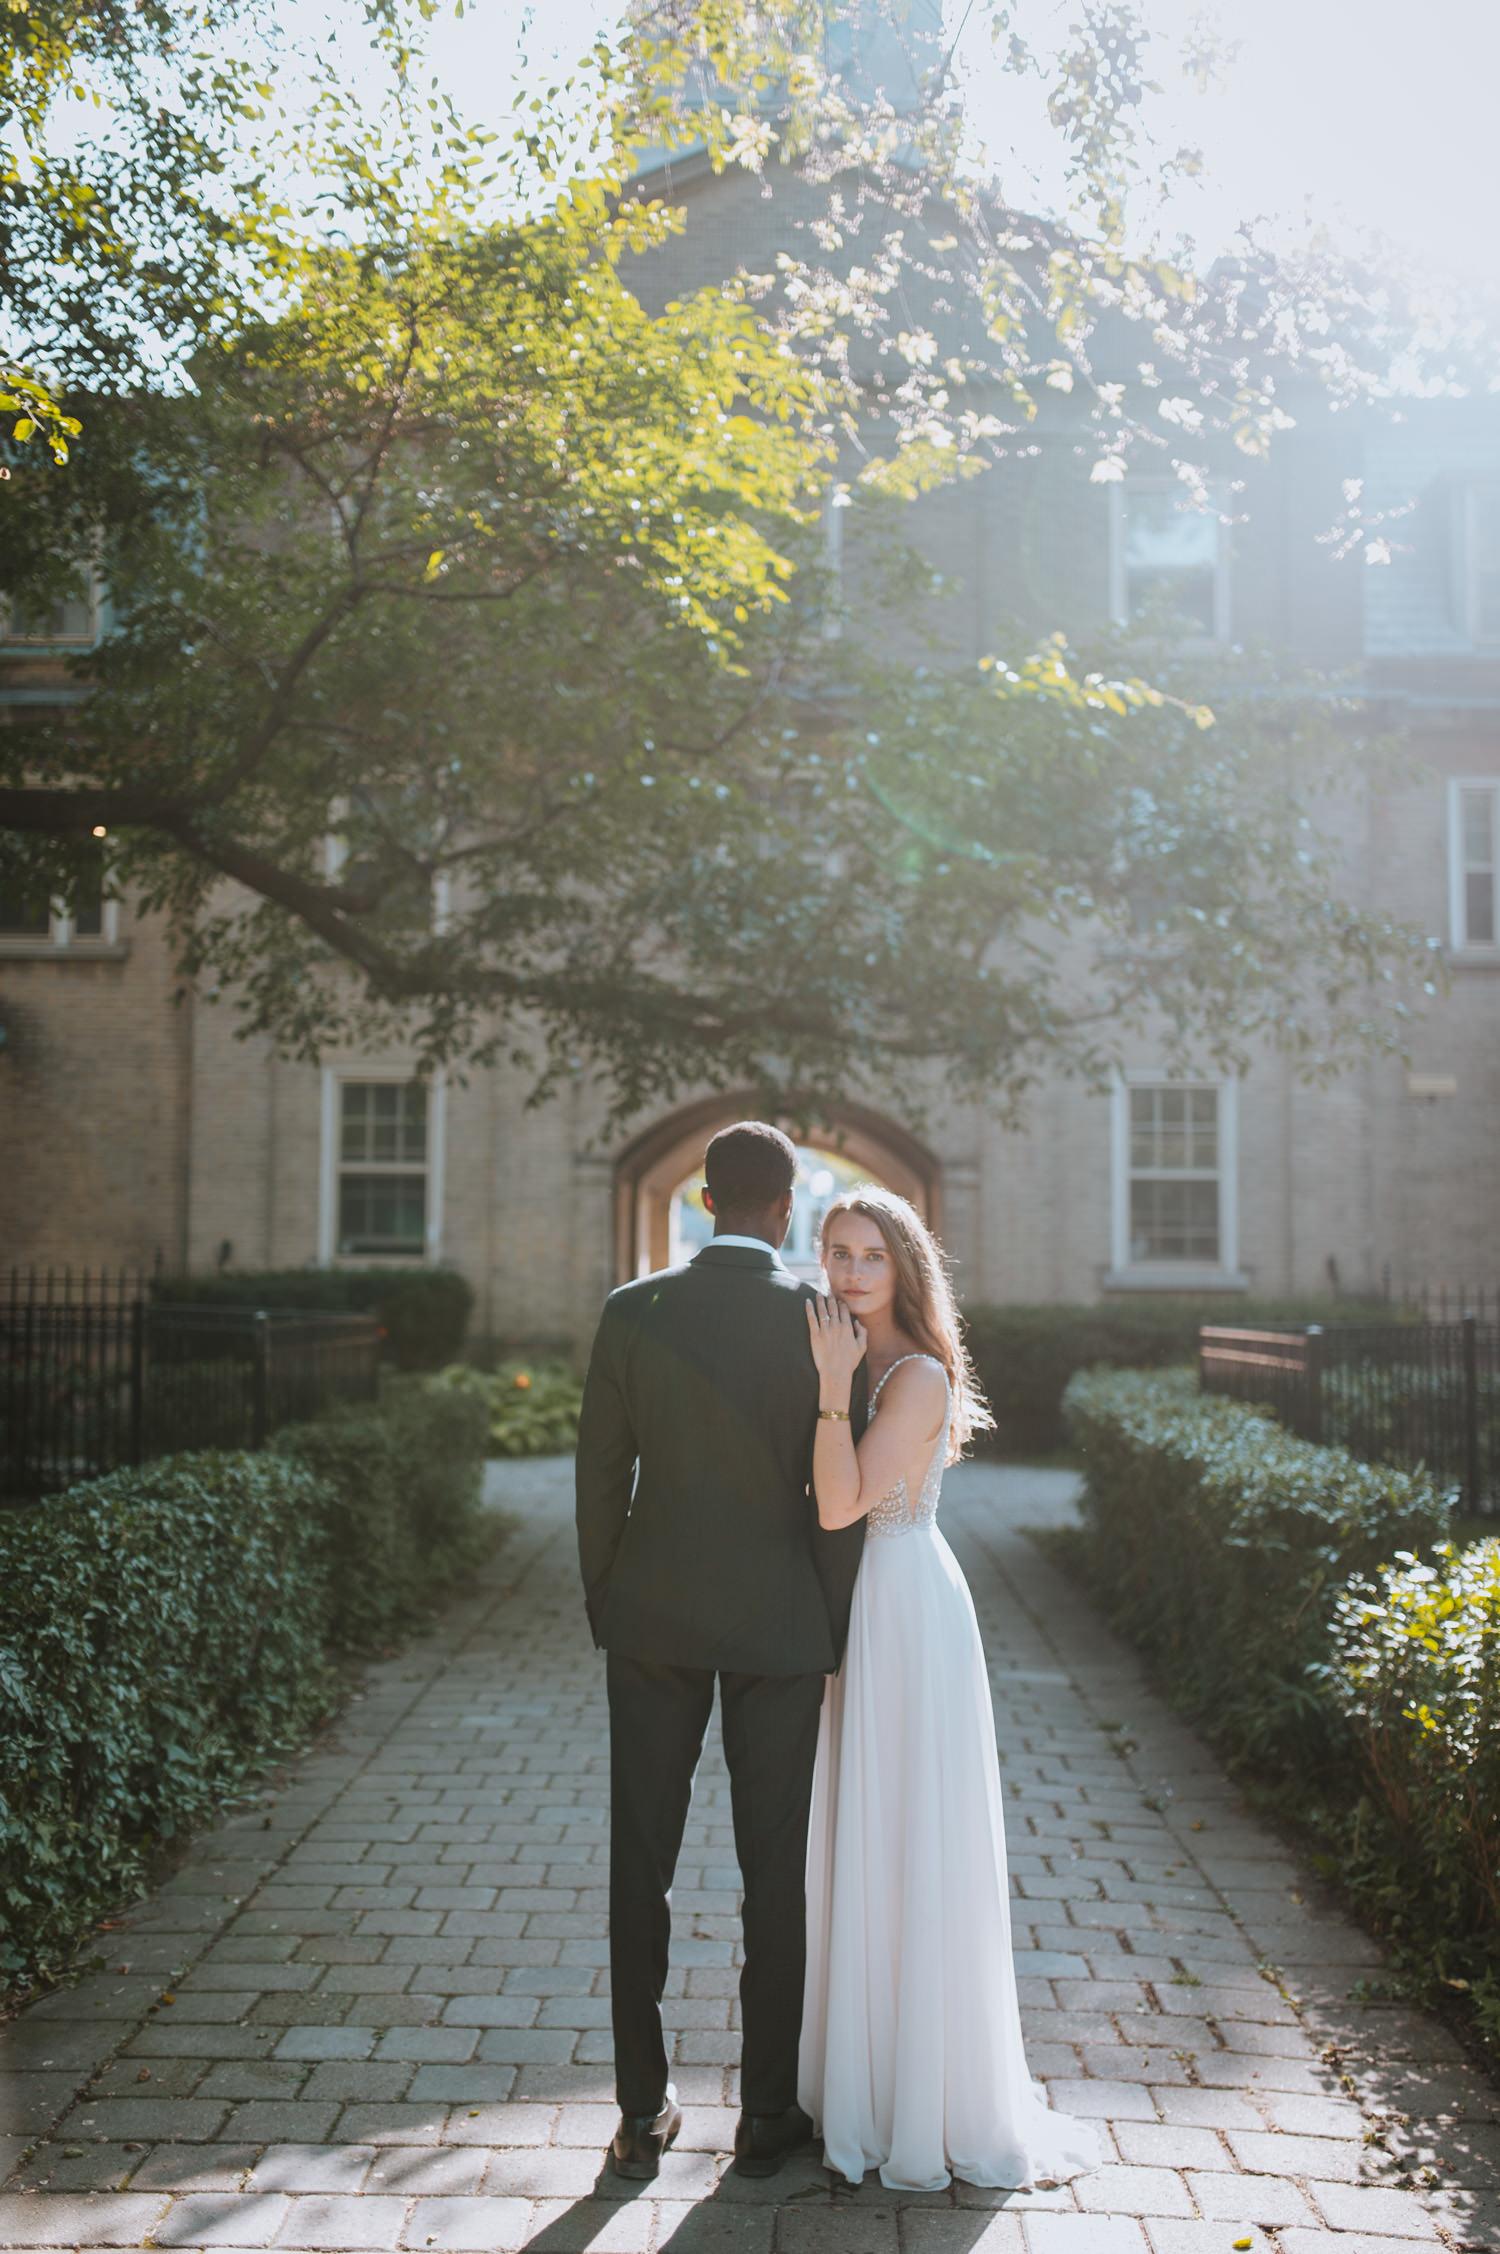 Sunny wedding photography at University of Toronto bride portrait